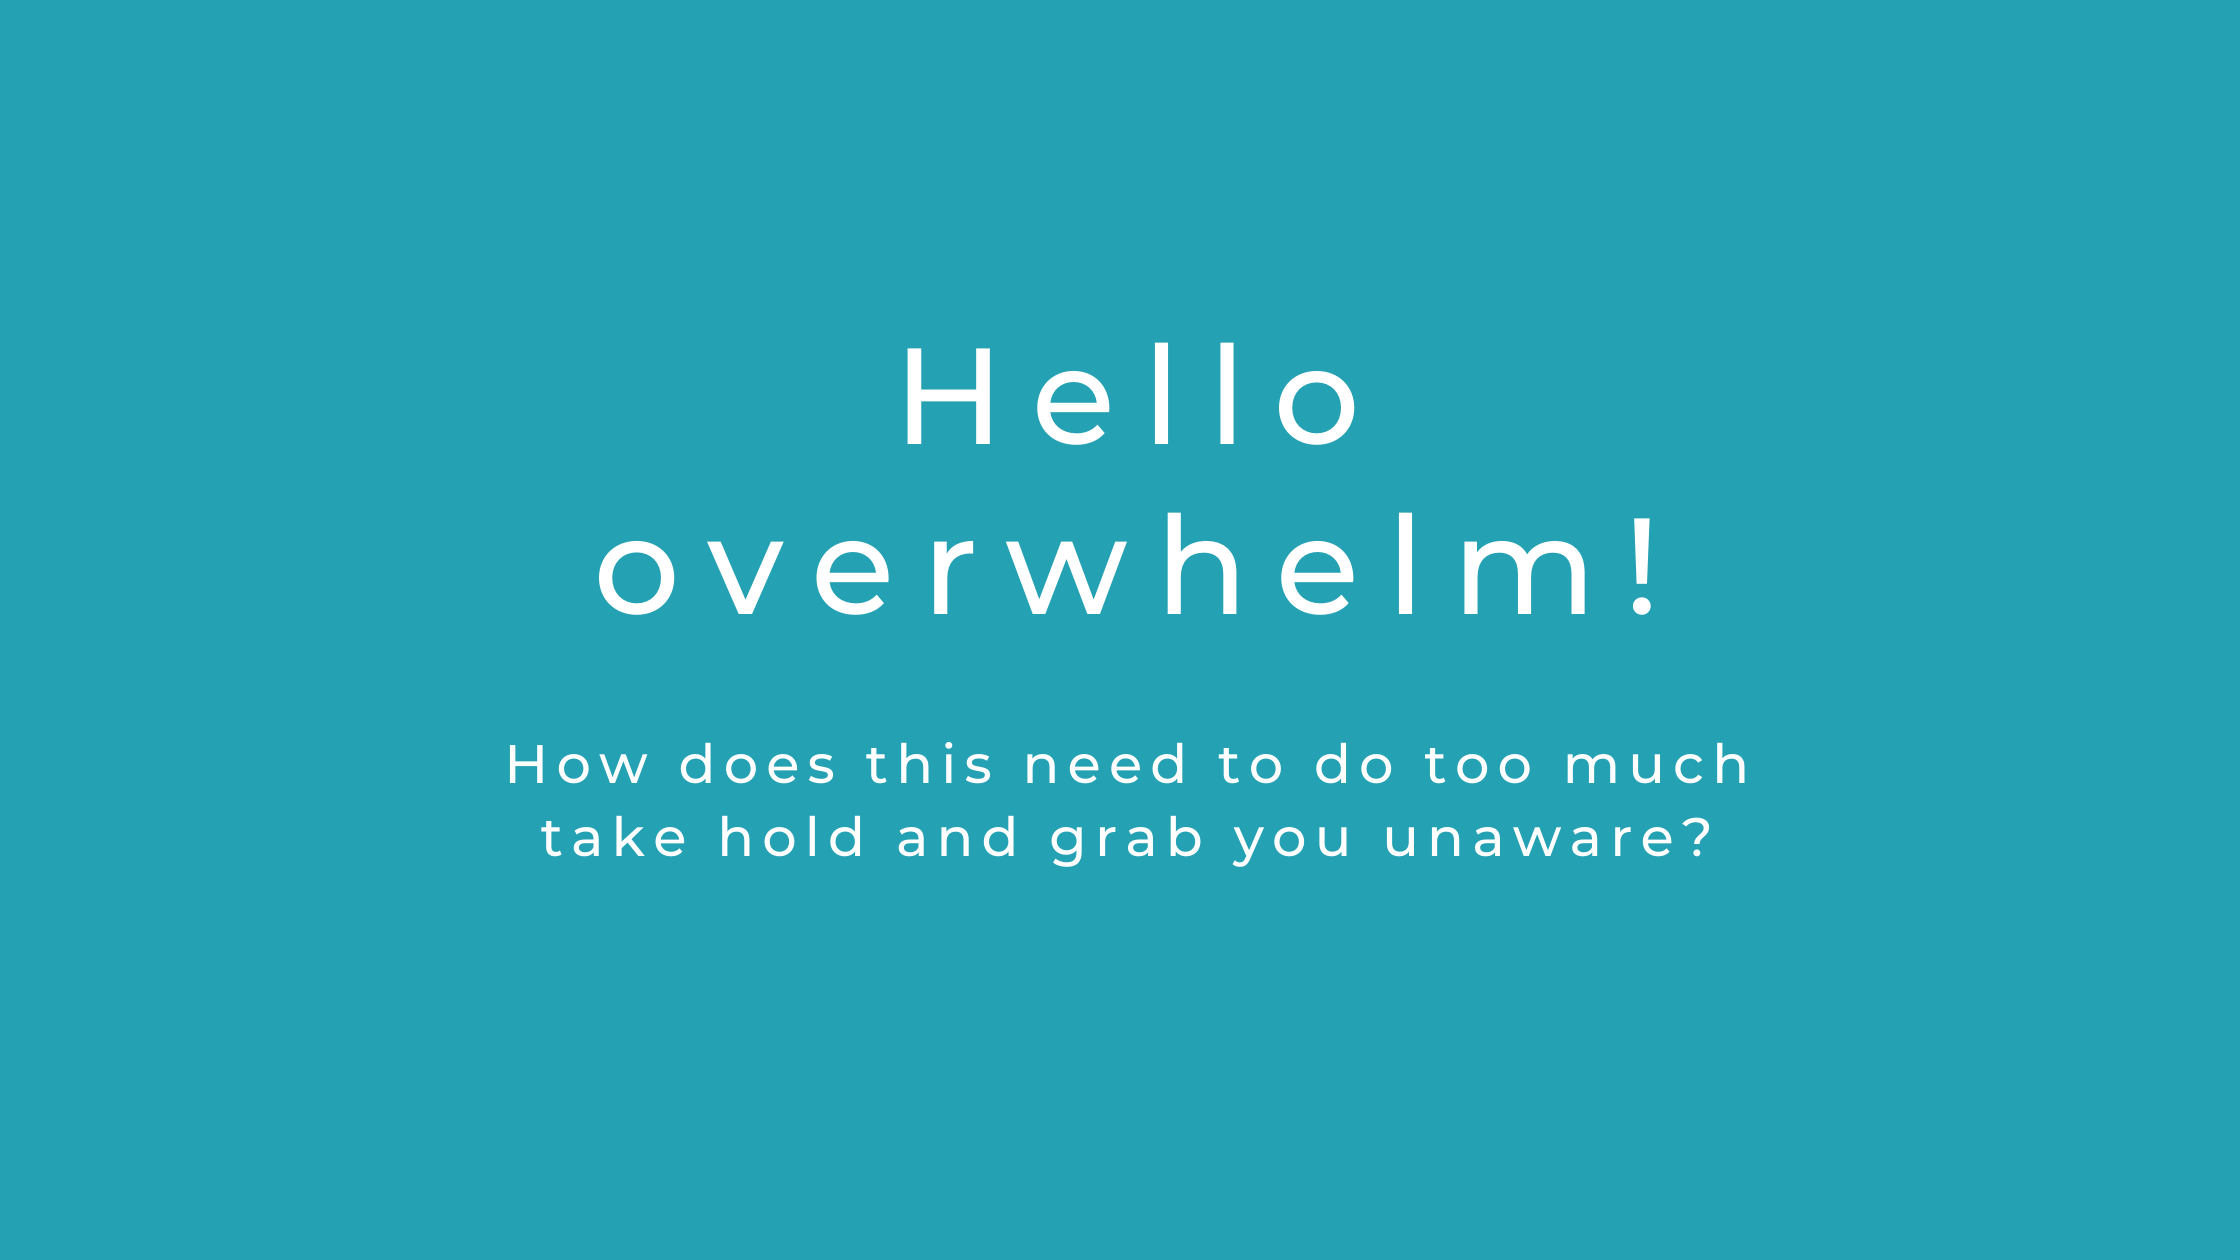 Hello overwhelm blog header image